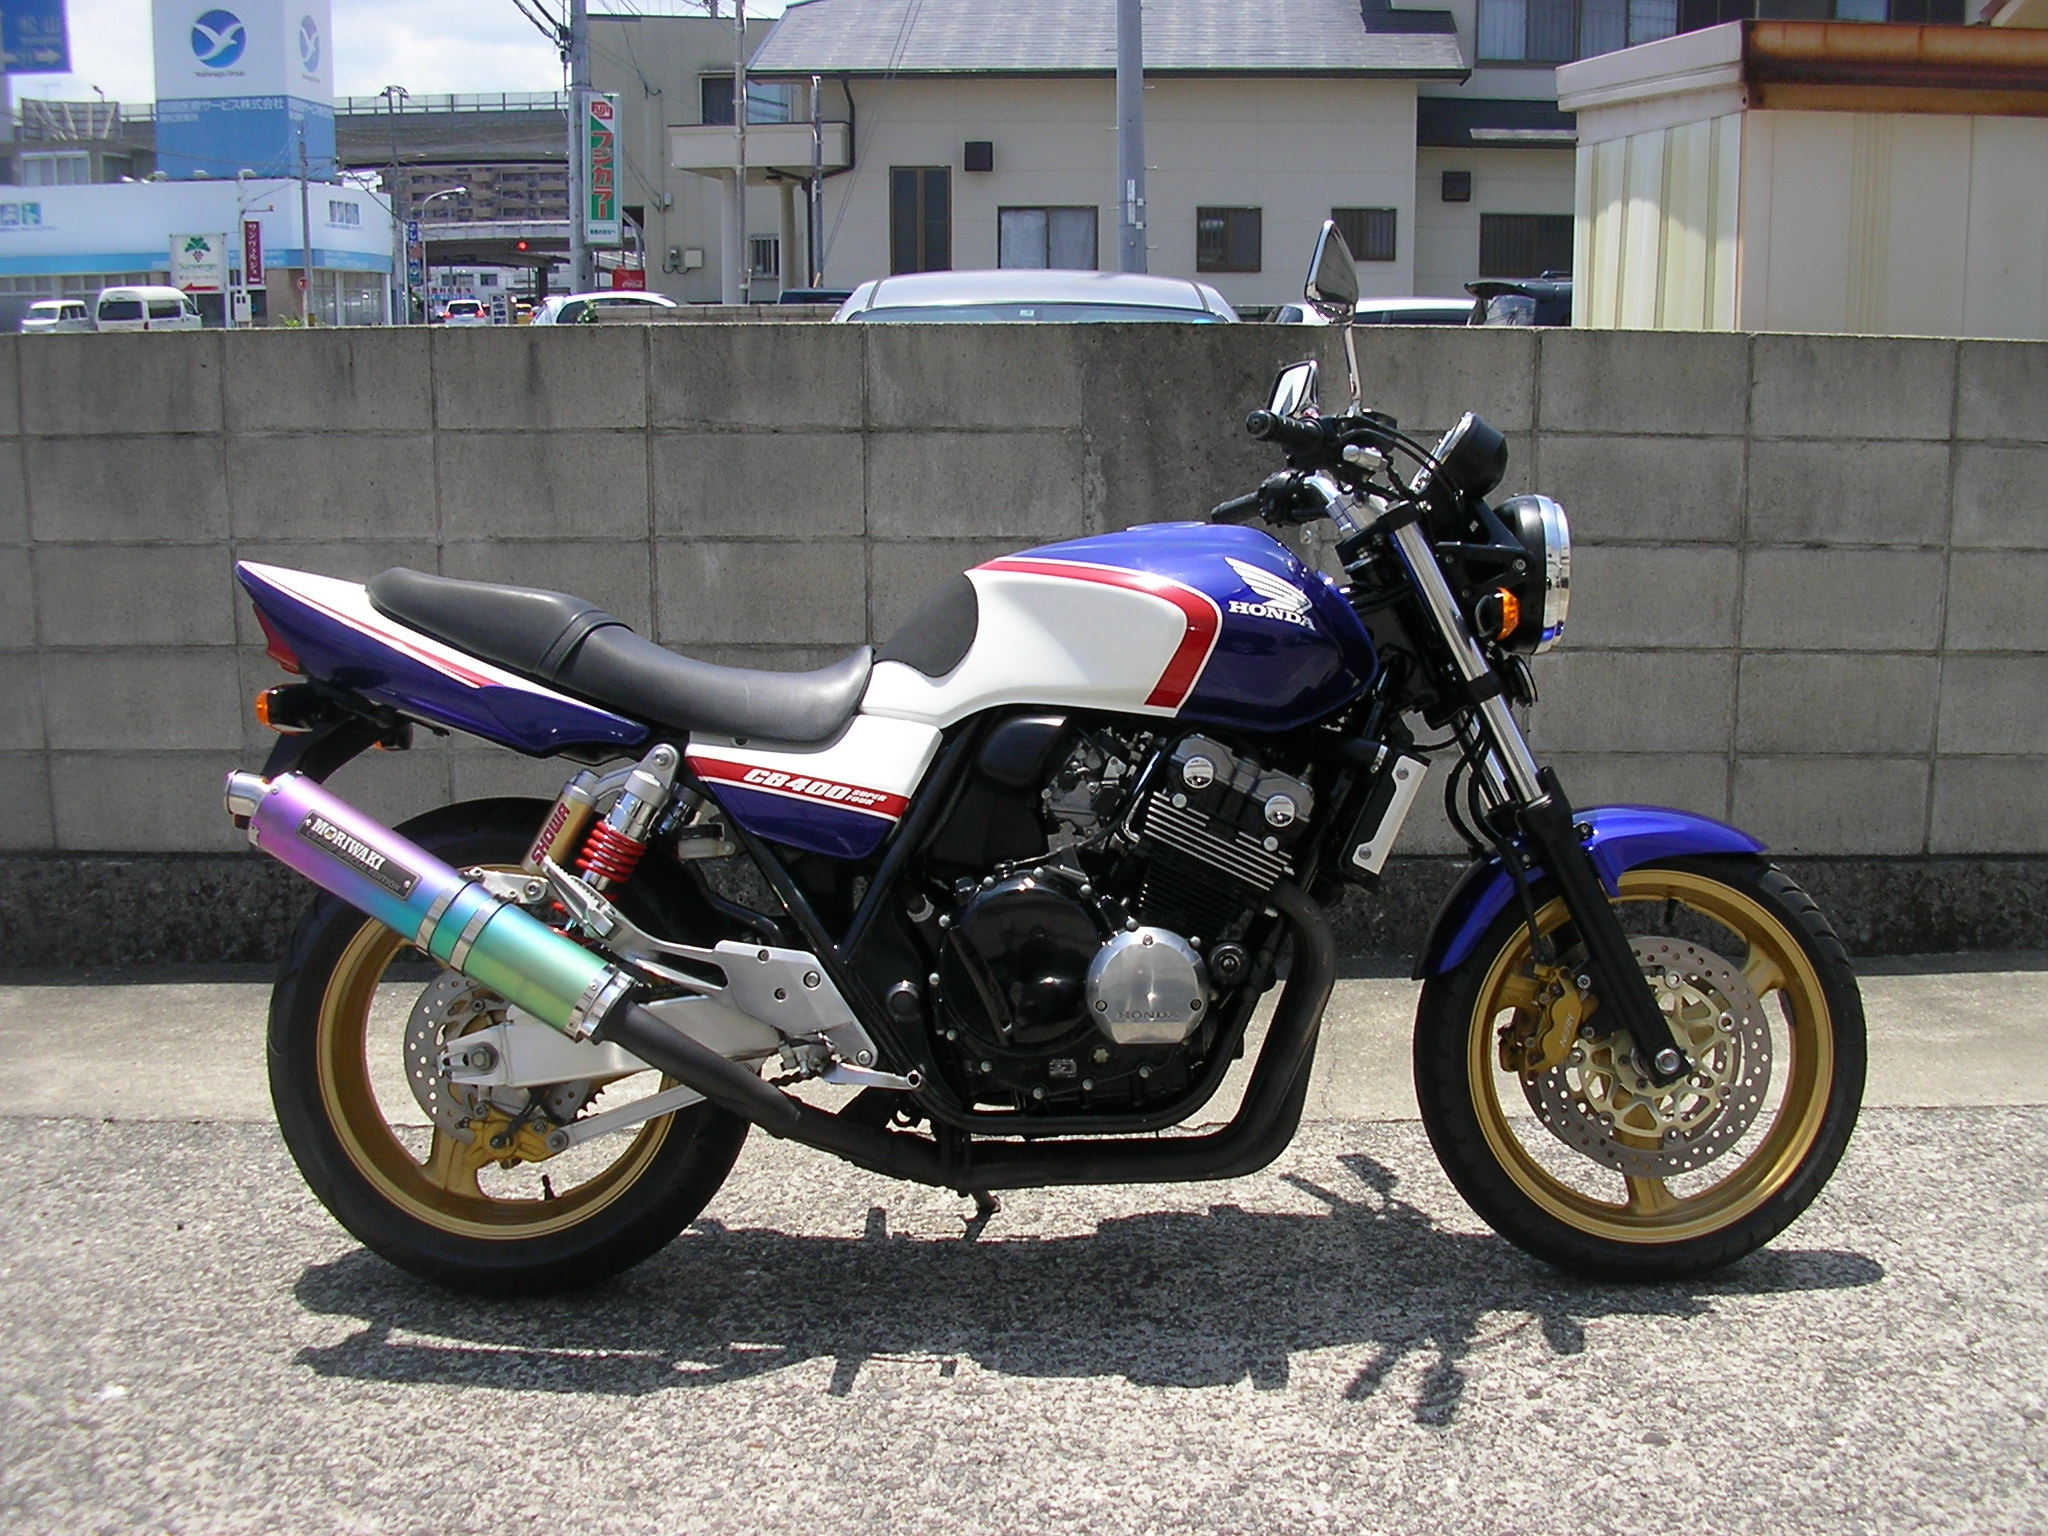 CB400SF VTEC2 (FC-000) - 【公式】レンタルバイクのベストBike® 新大阪駅前